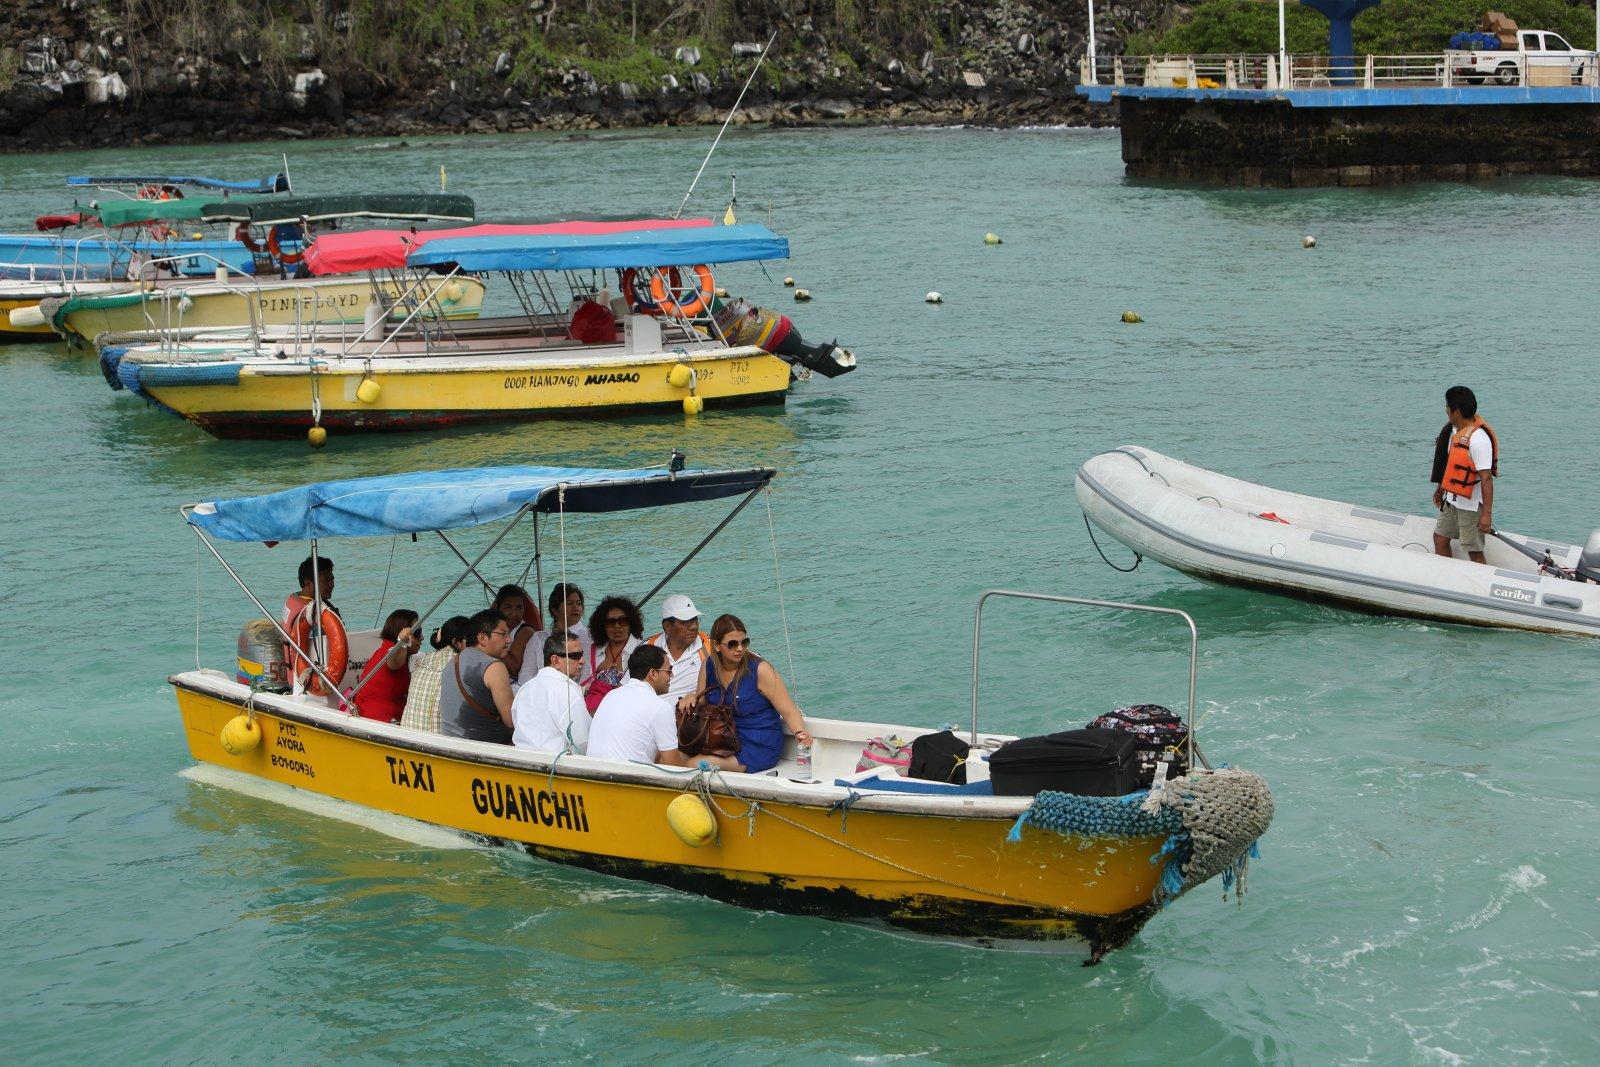 Galapagos-Insel Santa Cruz - Kurze Transportwege mit Wassertaxis in Puerto Ayora